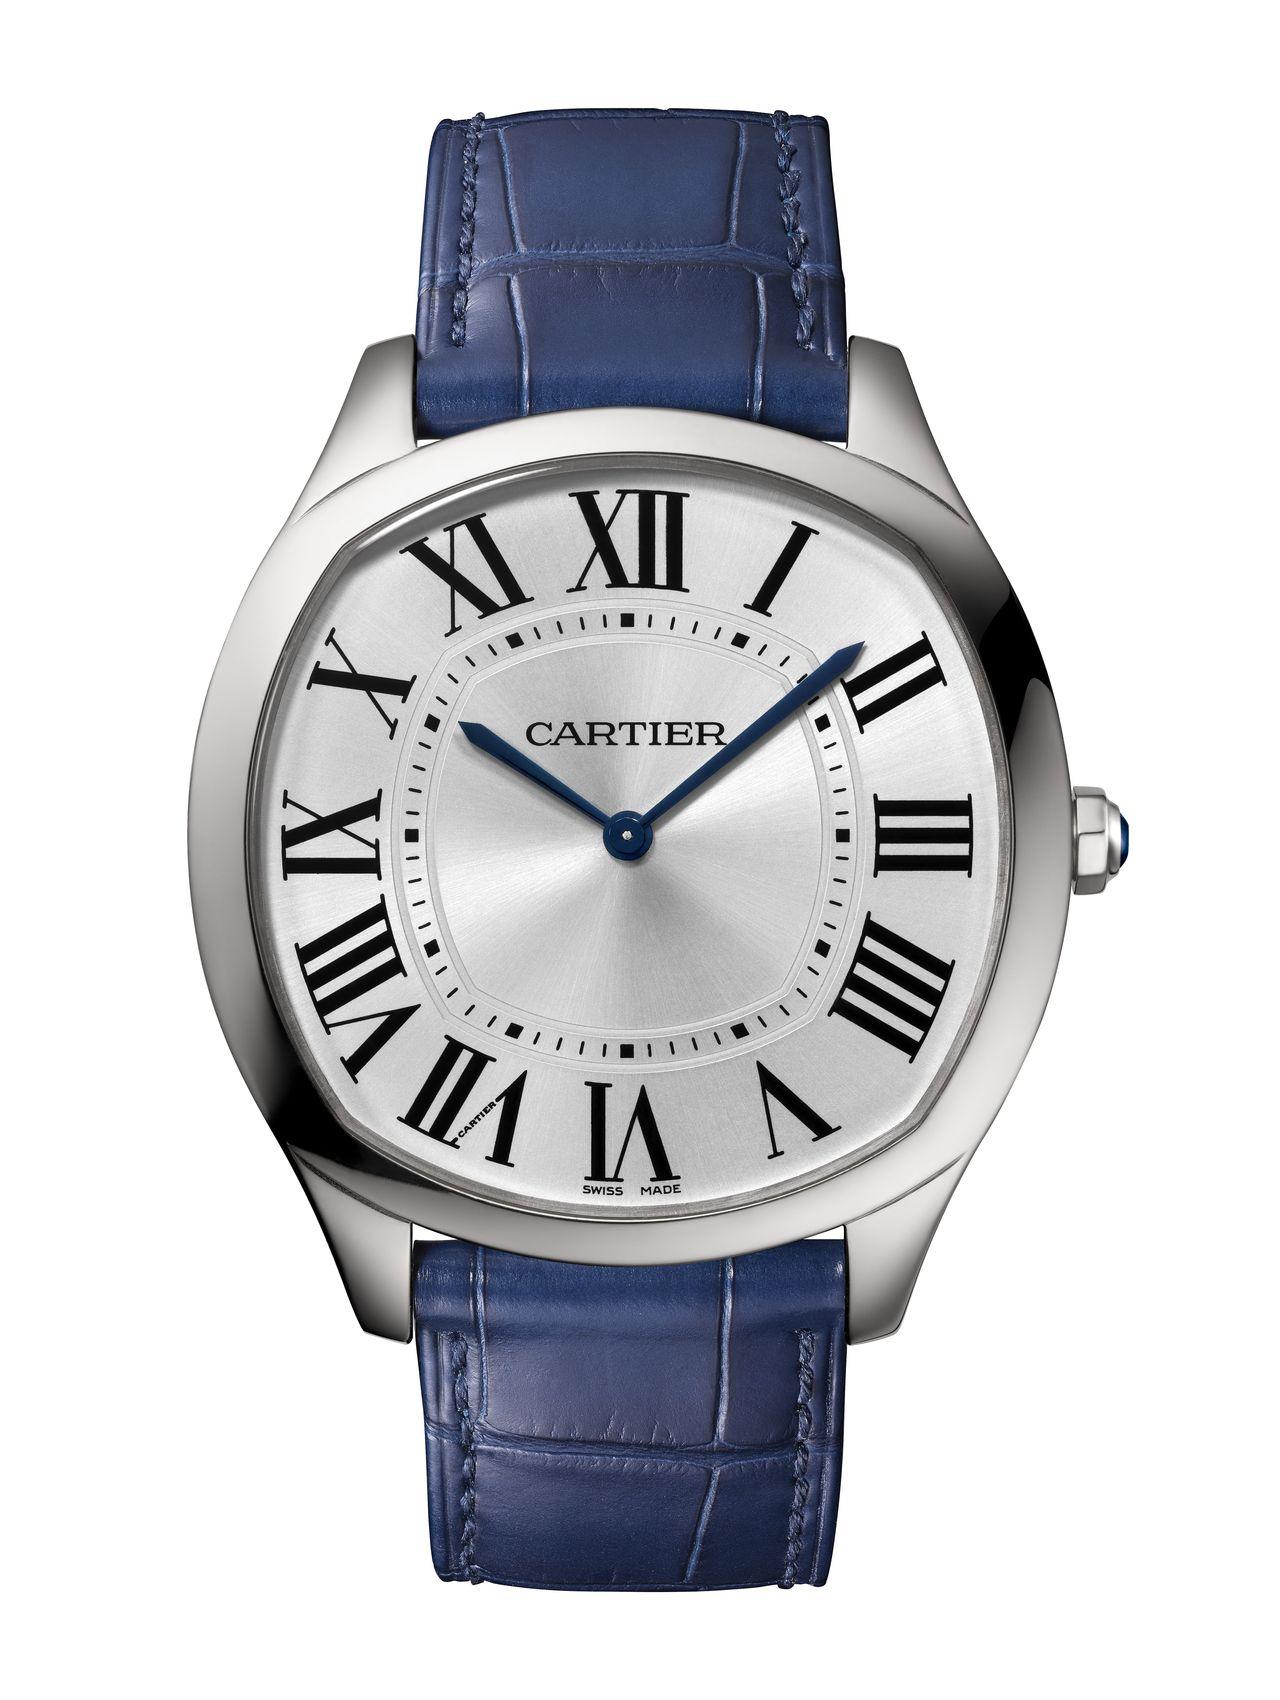 Cartier Drive de Cartier Extra Falt - fehéraranyban kimondottan diszkrét